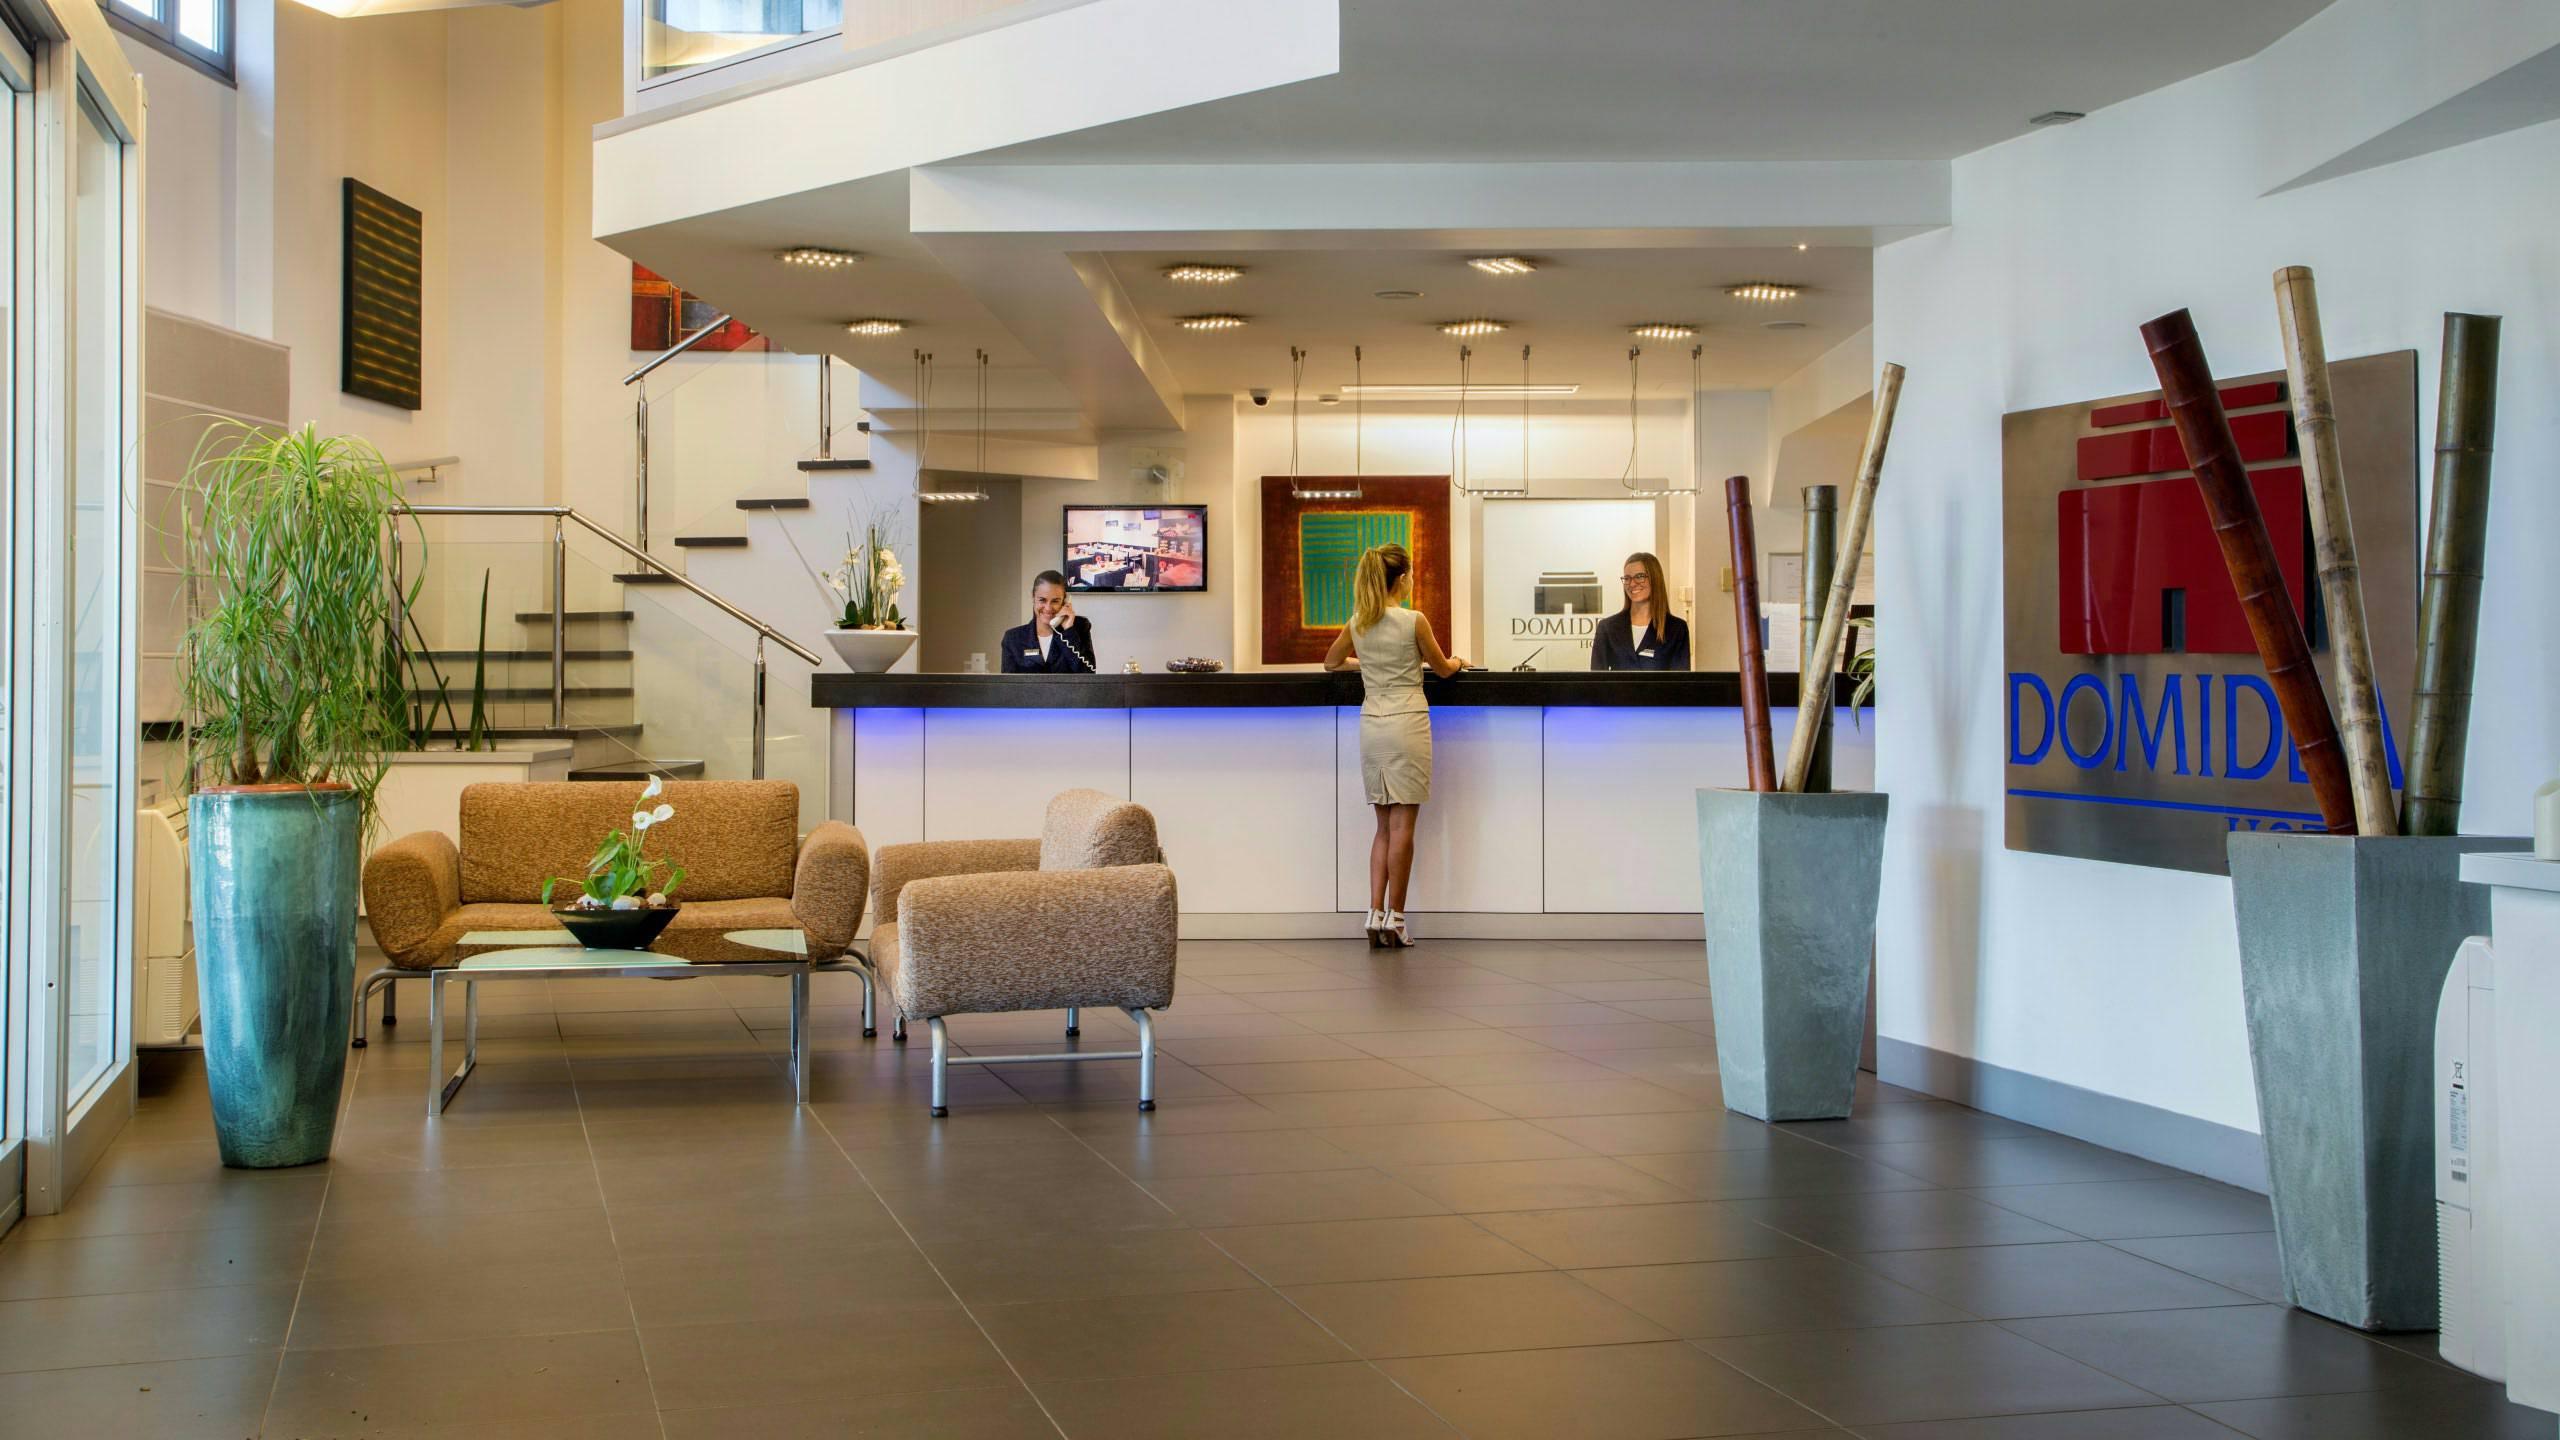 Domidea-Business-Hotel-Rome-common-areas-06